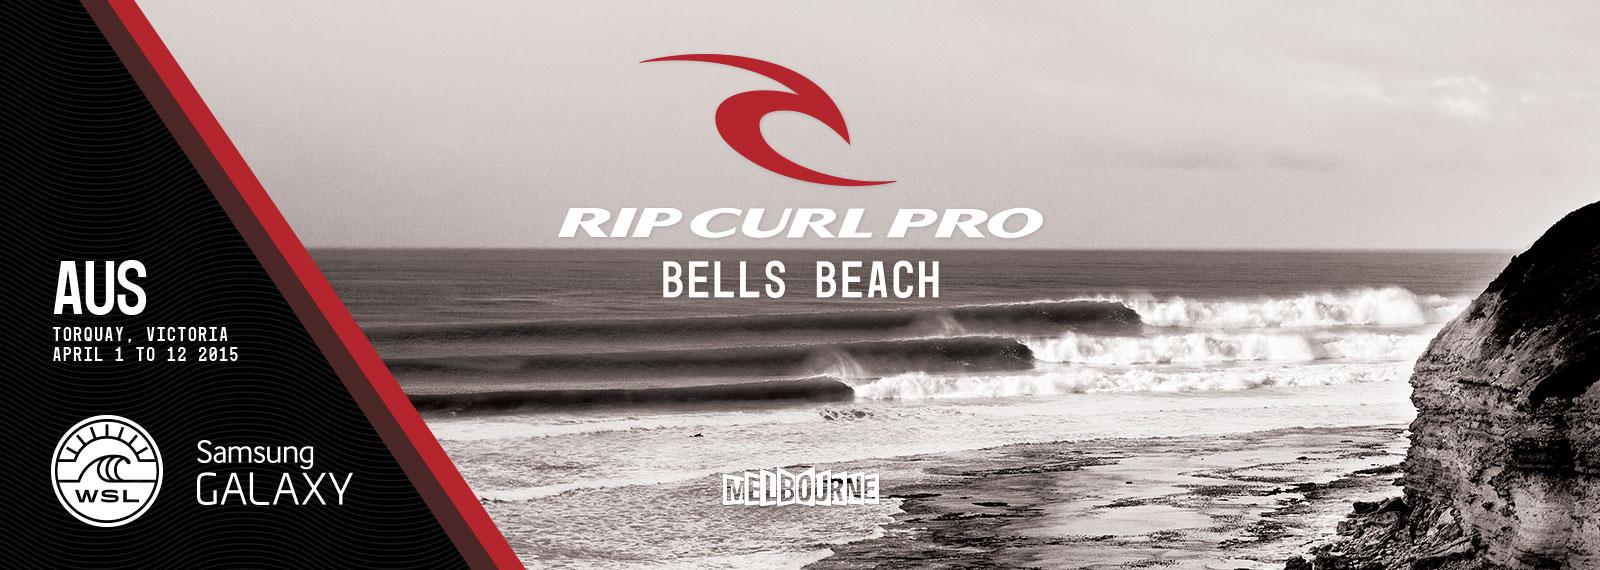 banner_2015_RCP-Bells_1600x570